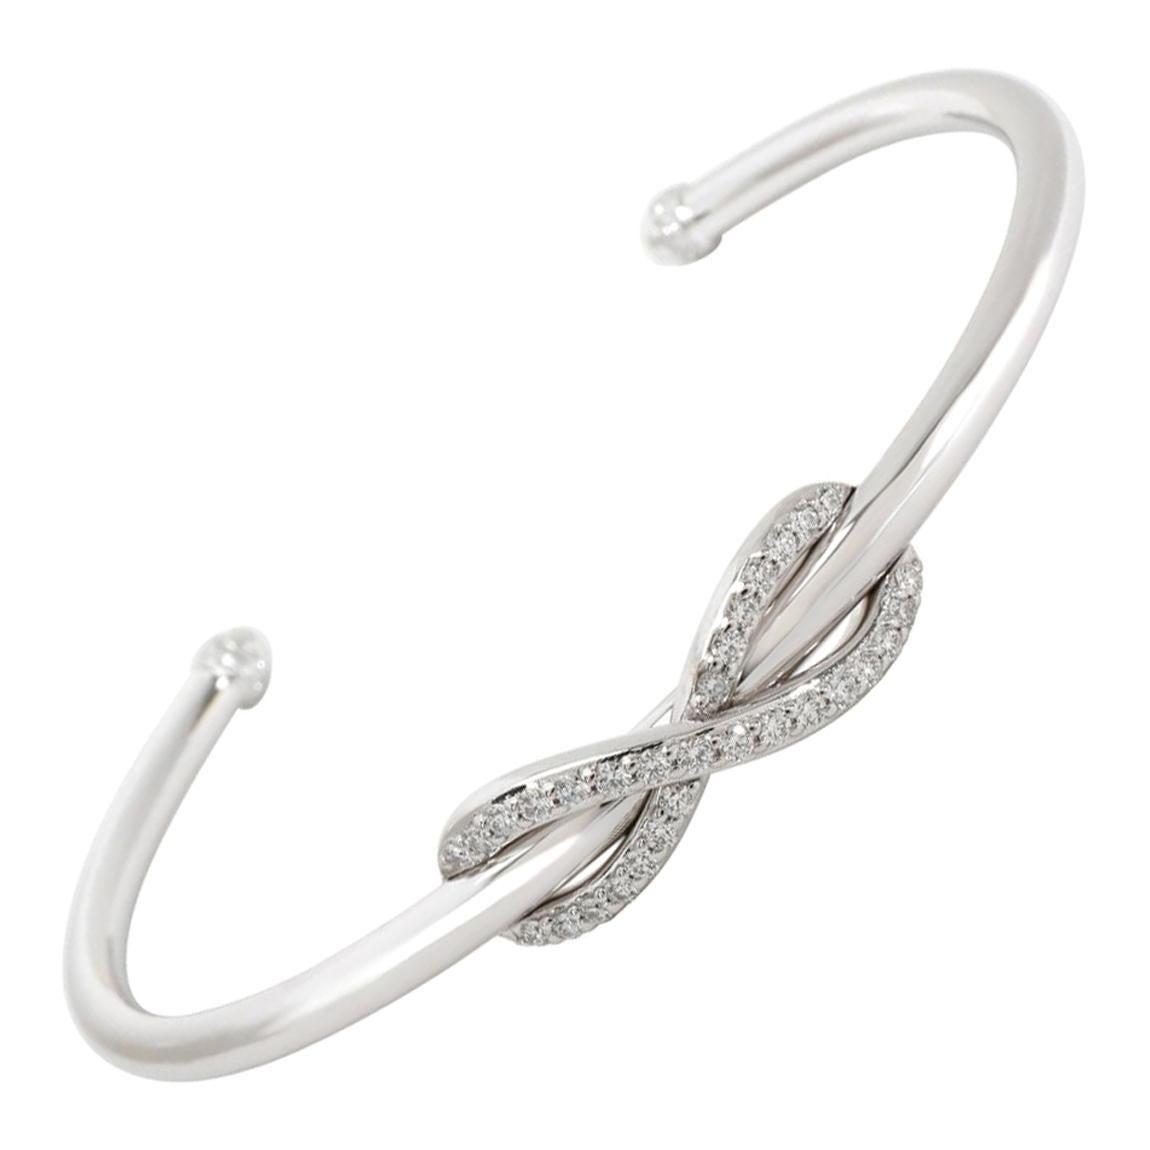 New Tiffany & Co. Infinity 18k White Gold Cuff Bracelet 'Medium Size'